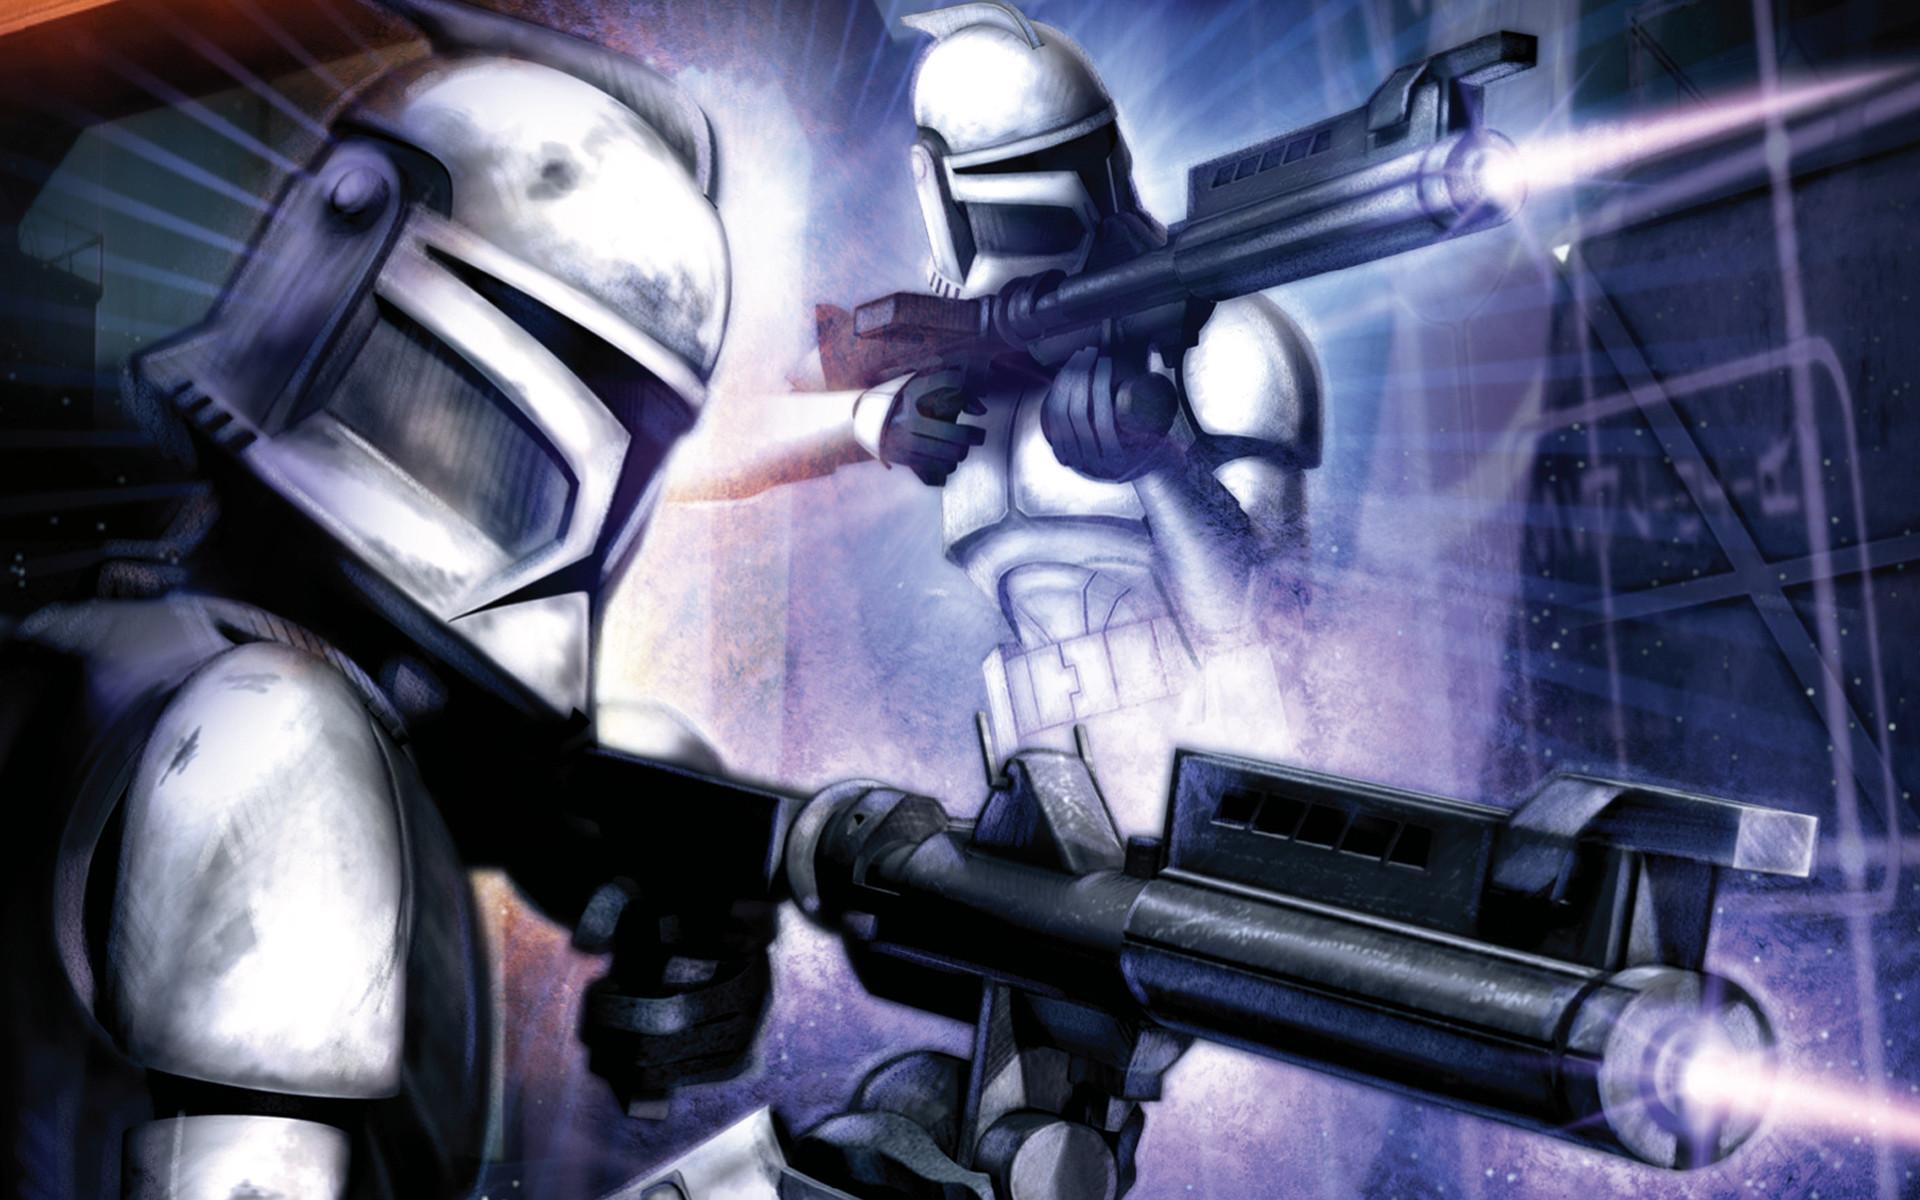 Star wars wallpaper hd 1080p + iconos – Taringa!